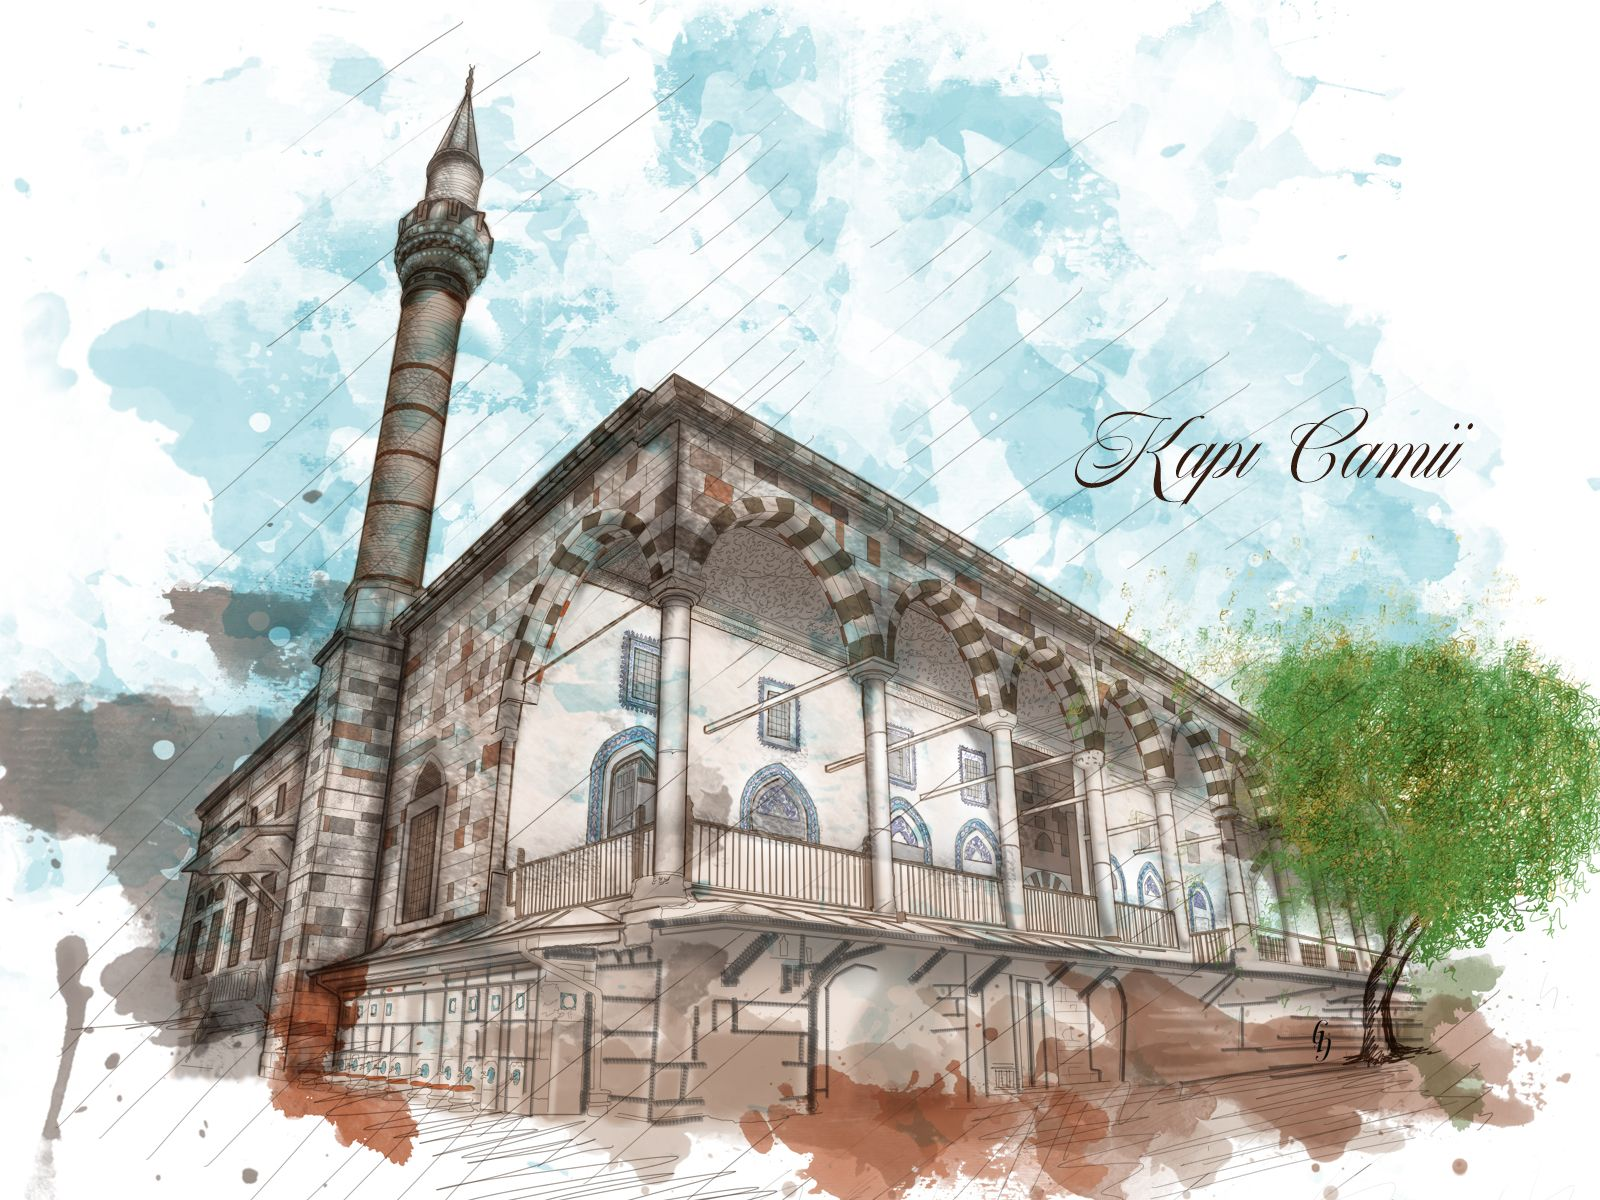 Kapı Camii (Ko…